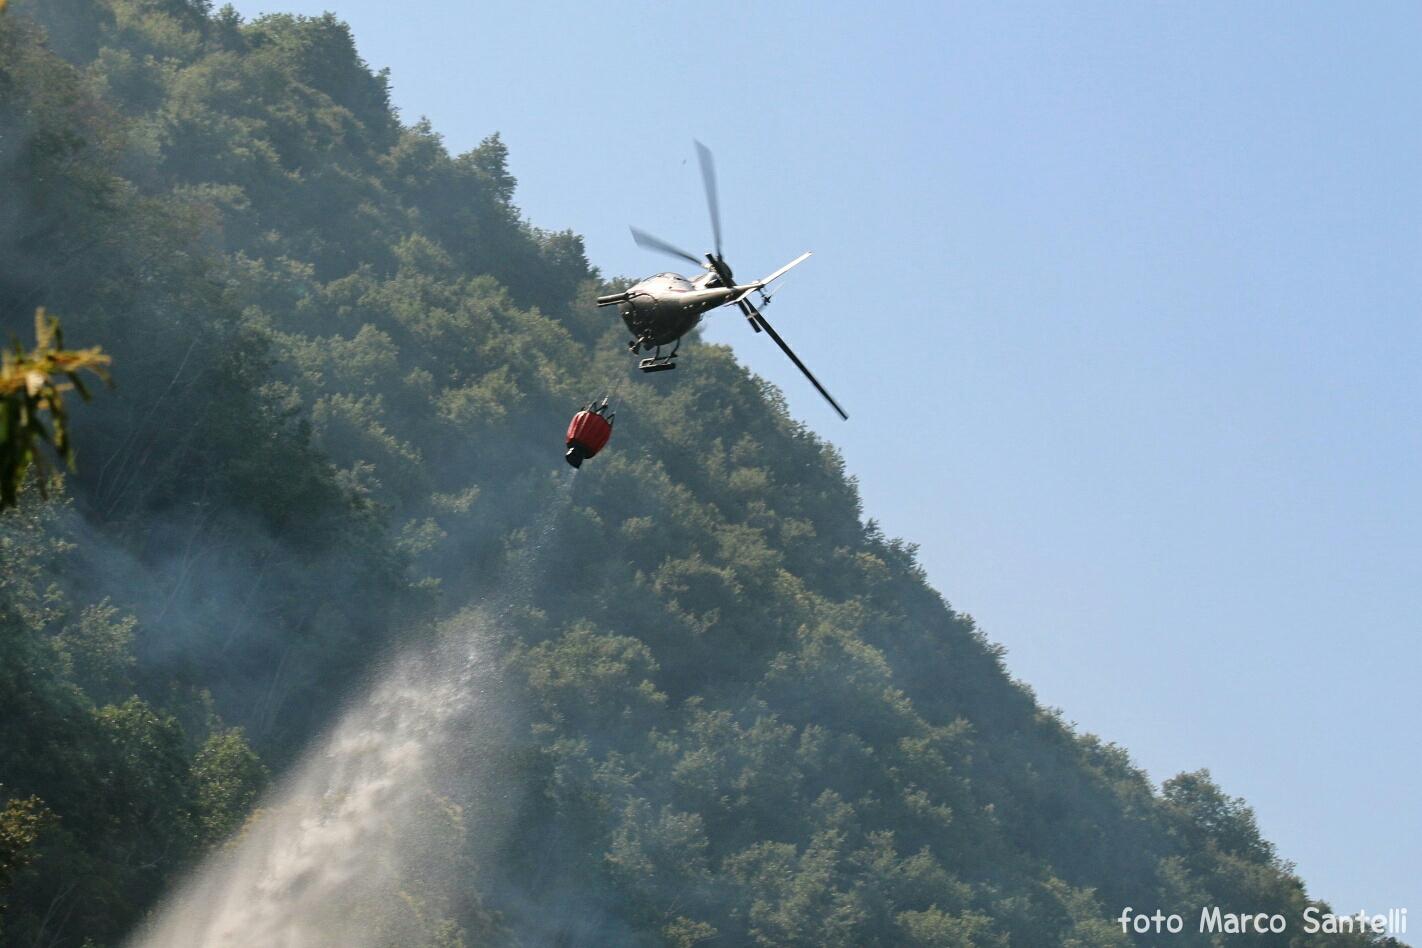 Incendio a Teverina, bruciati 2 ettari di bosco